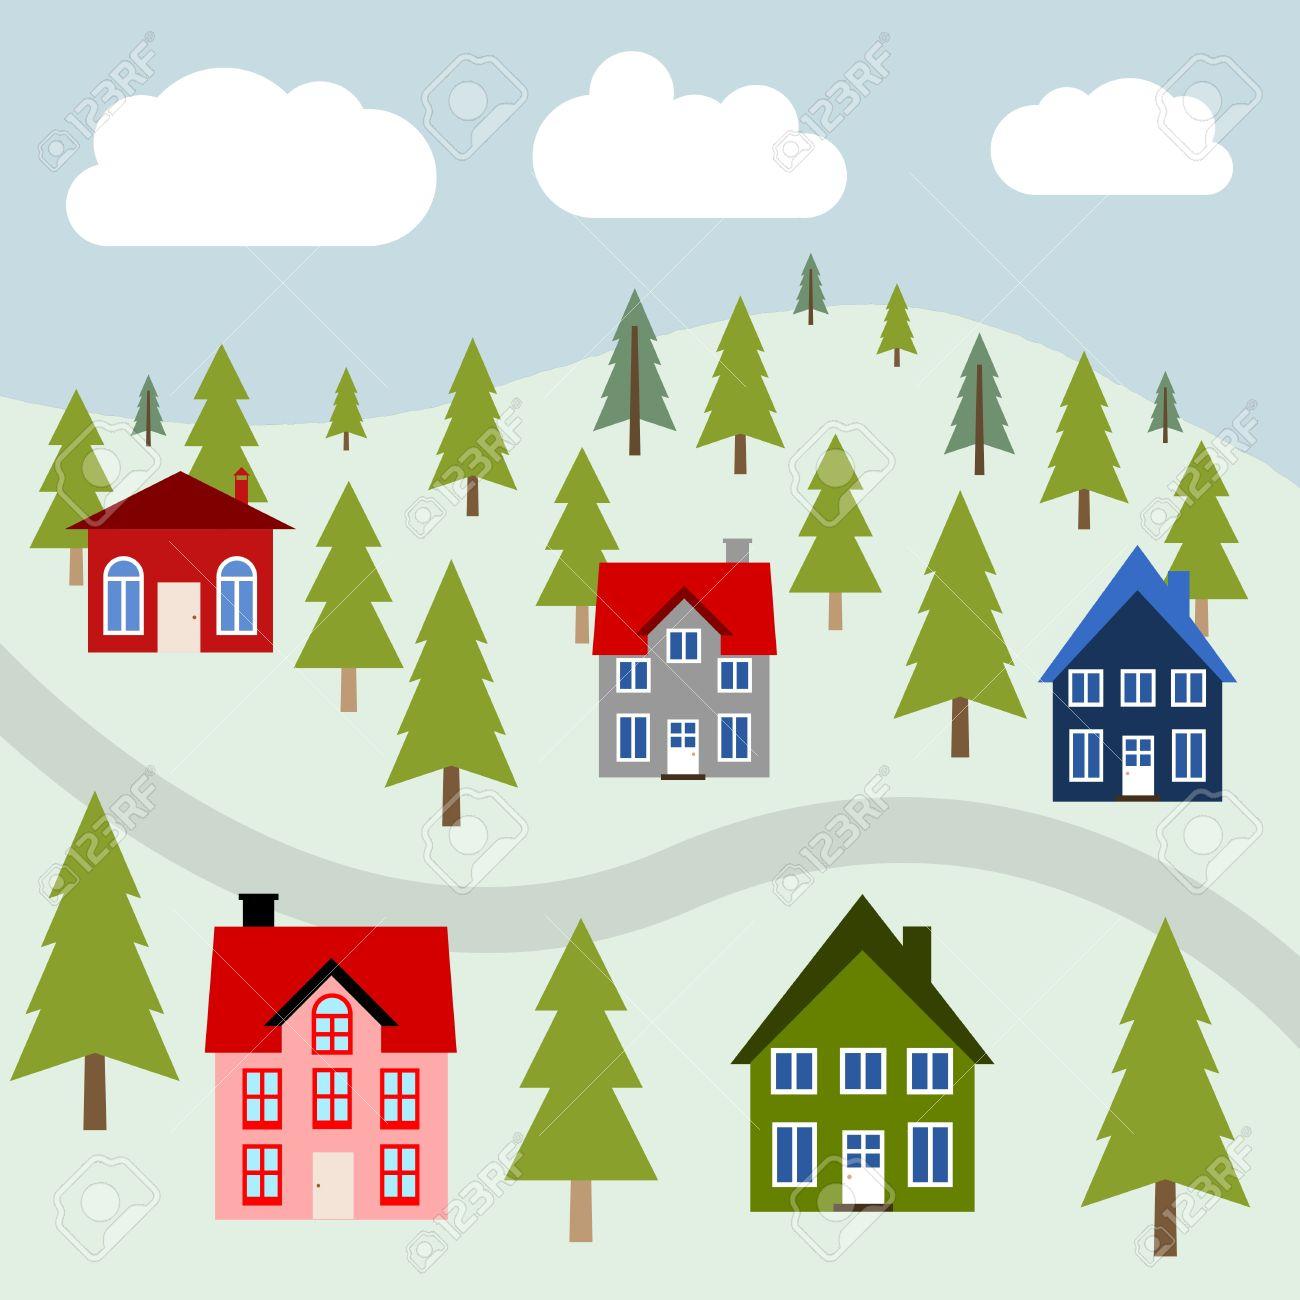 Mountain Town Illustration.